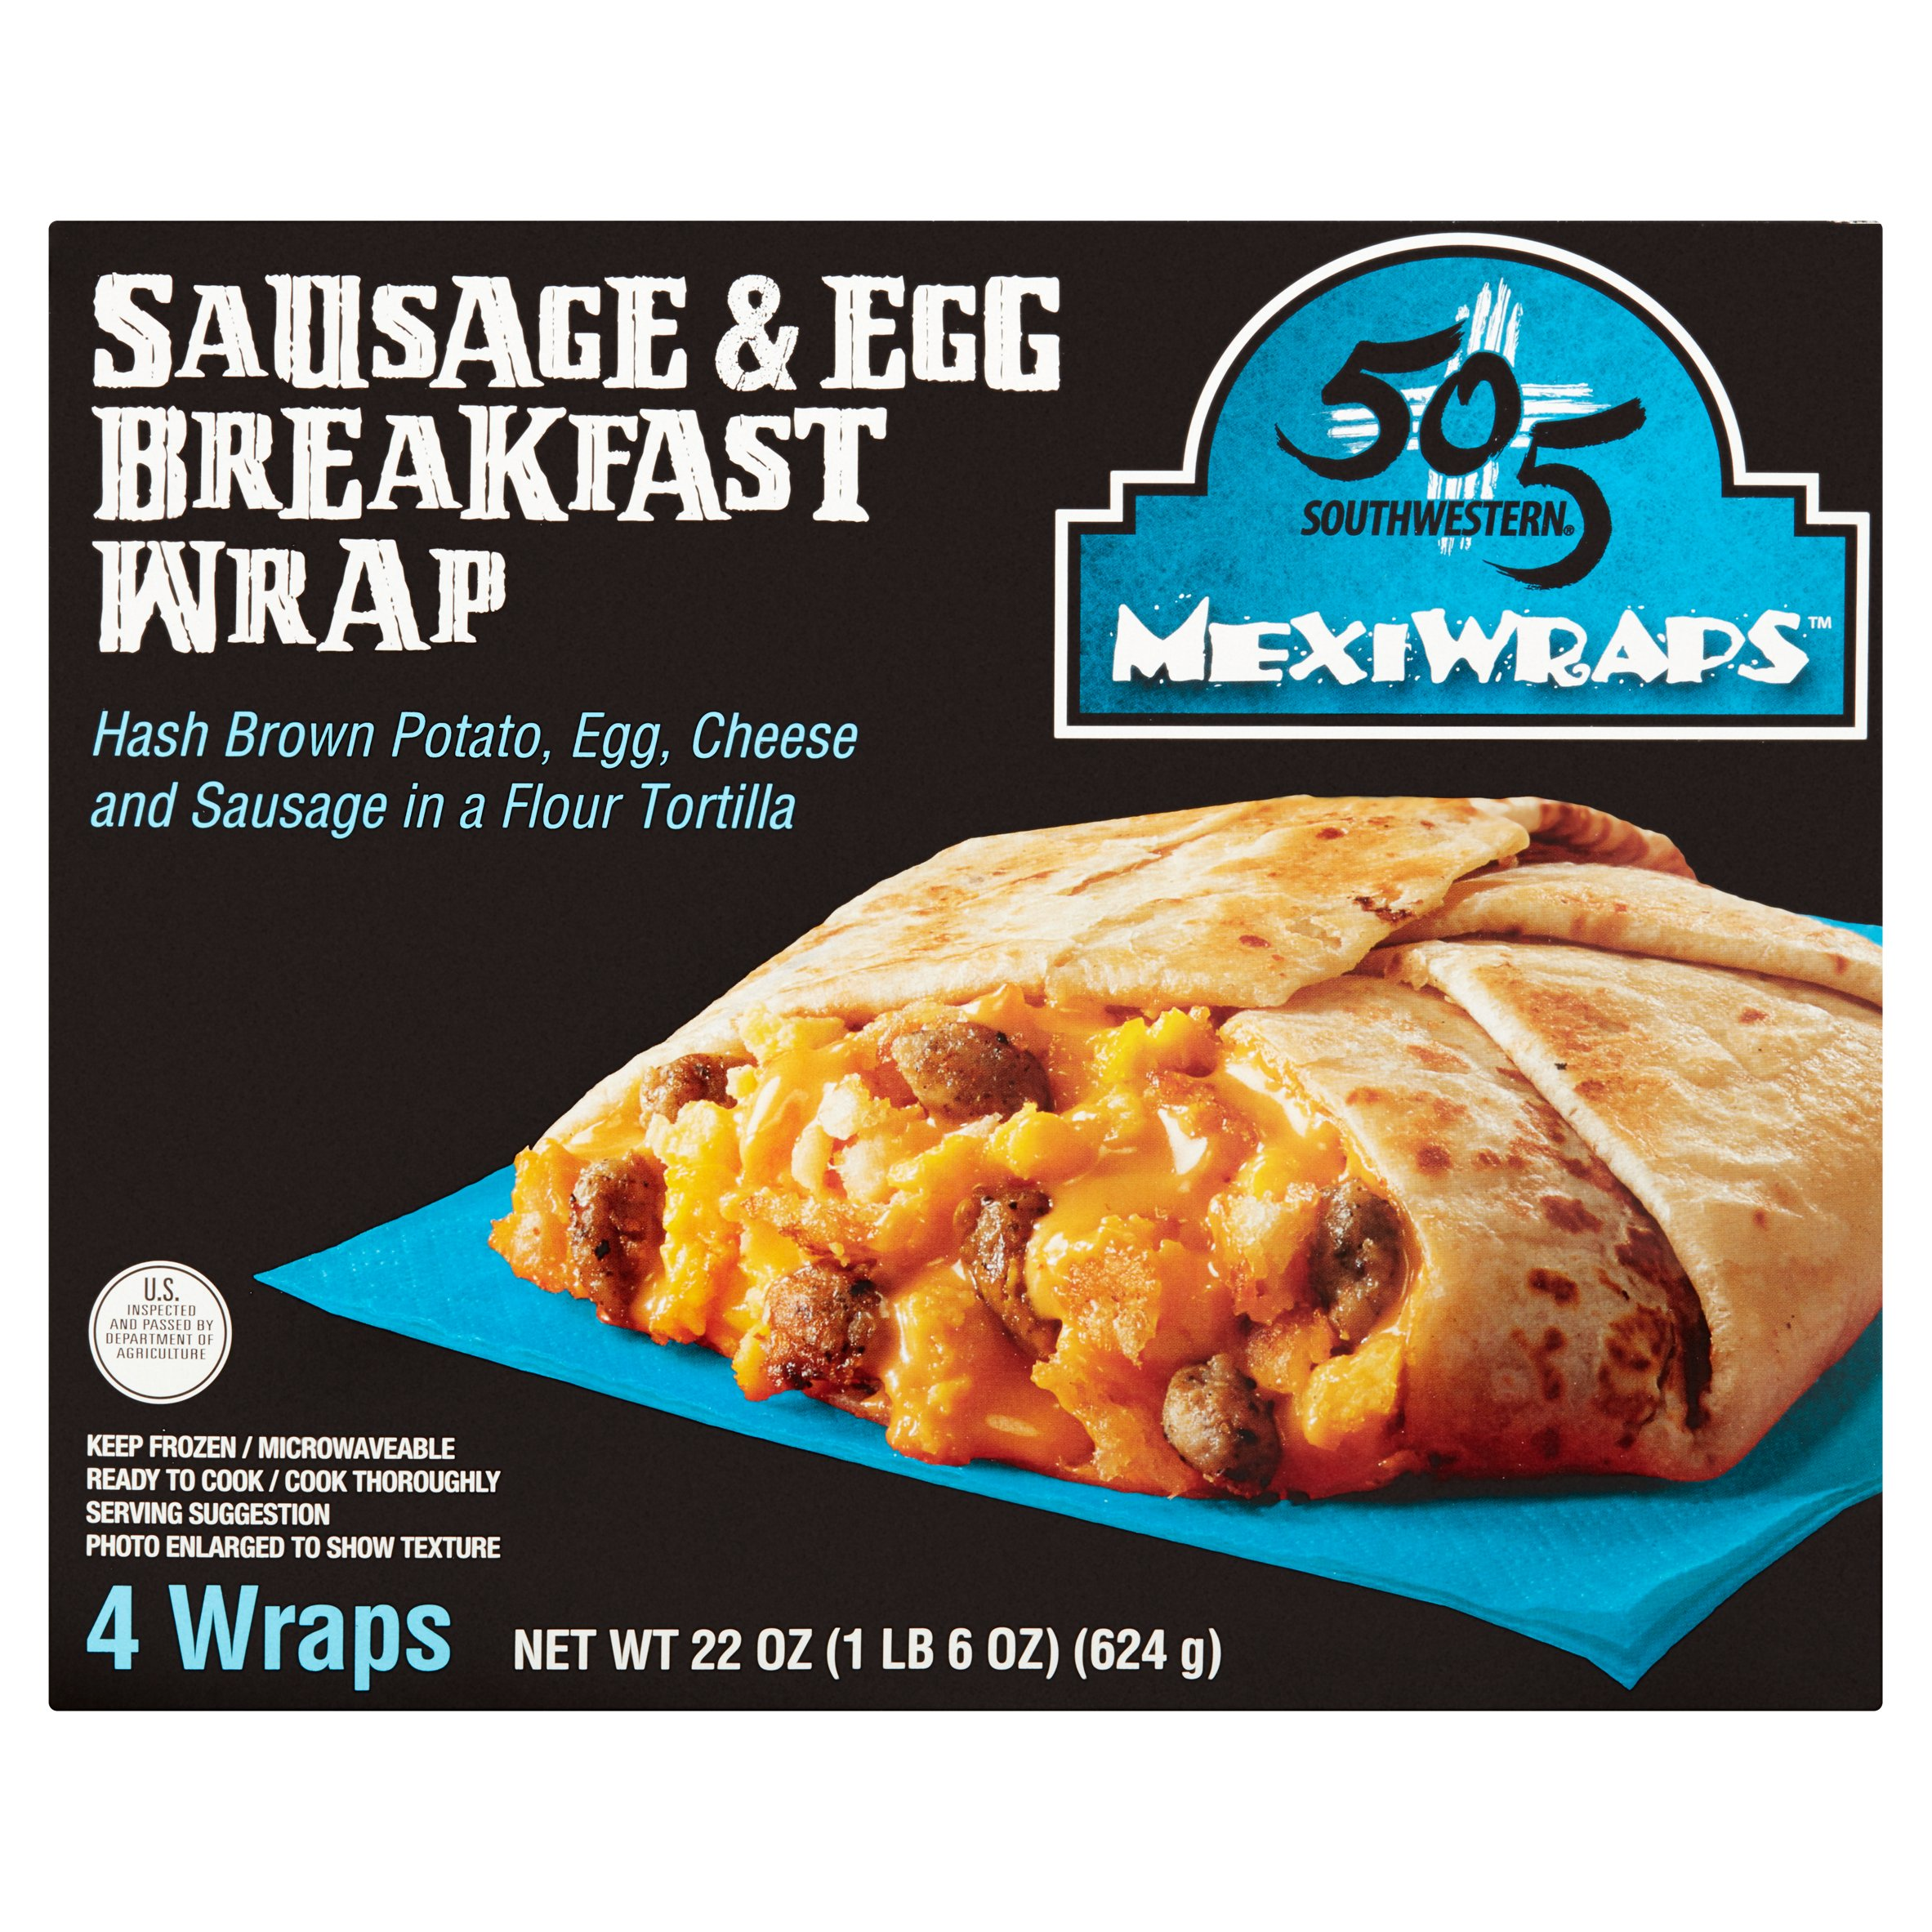 505 Southwestern MexiWraps Sausage & Egg Breakfast Wrap, 4 count, 22 oz